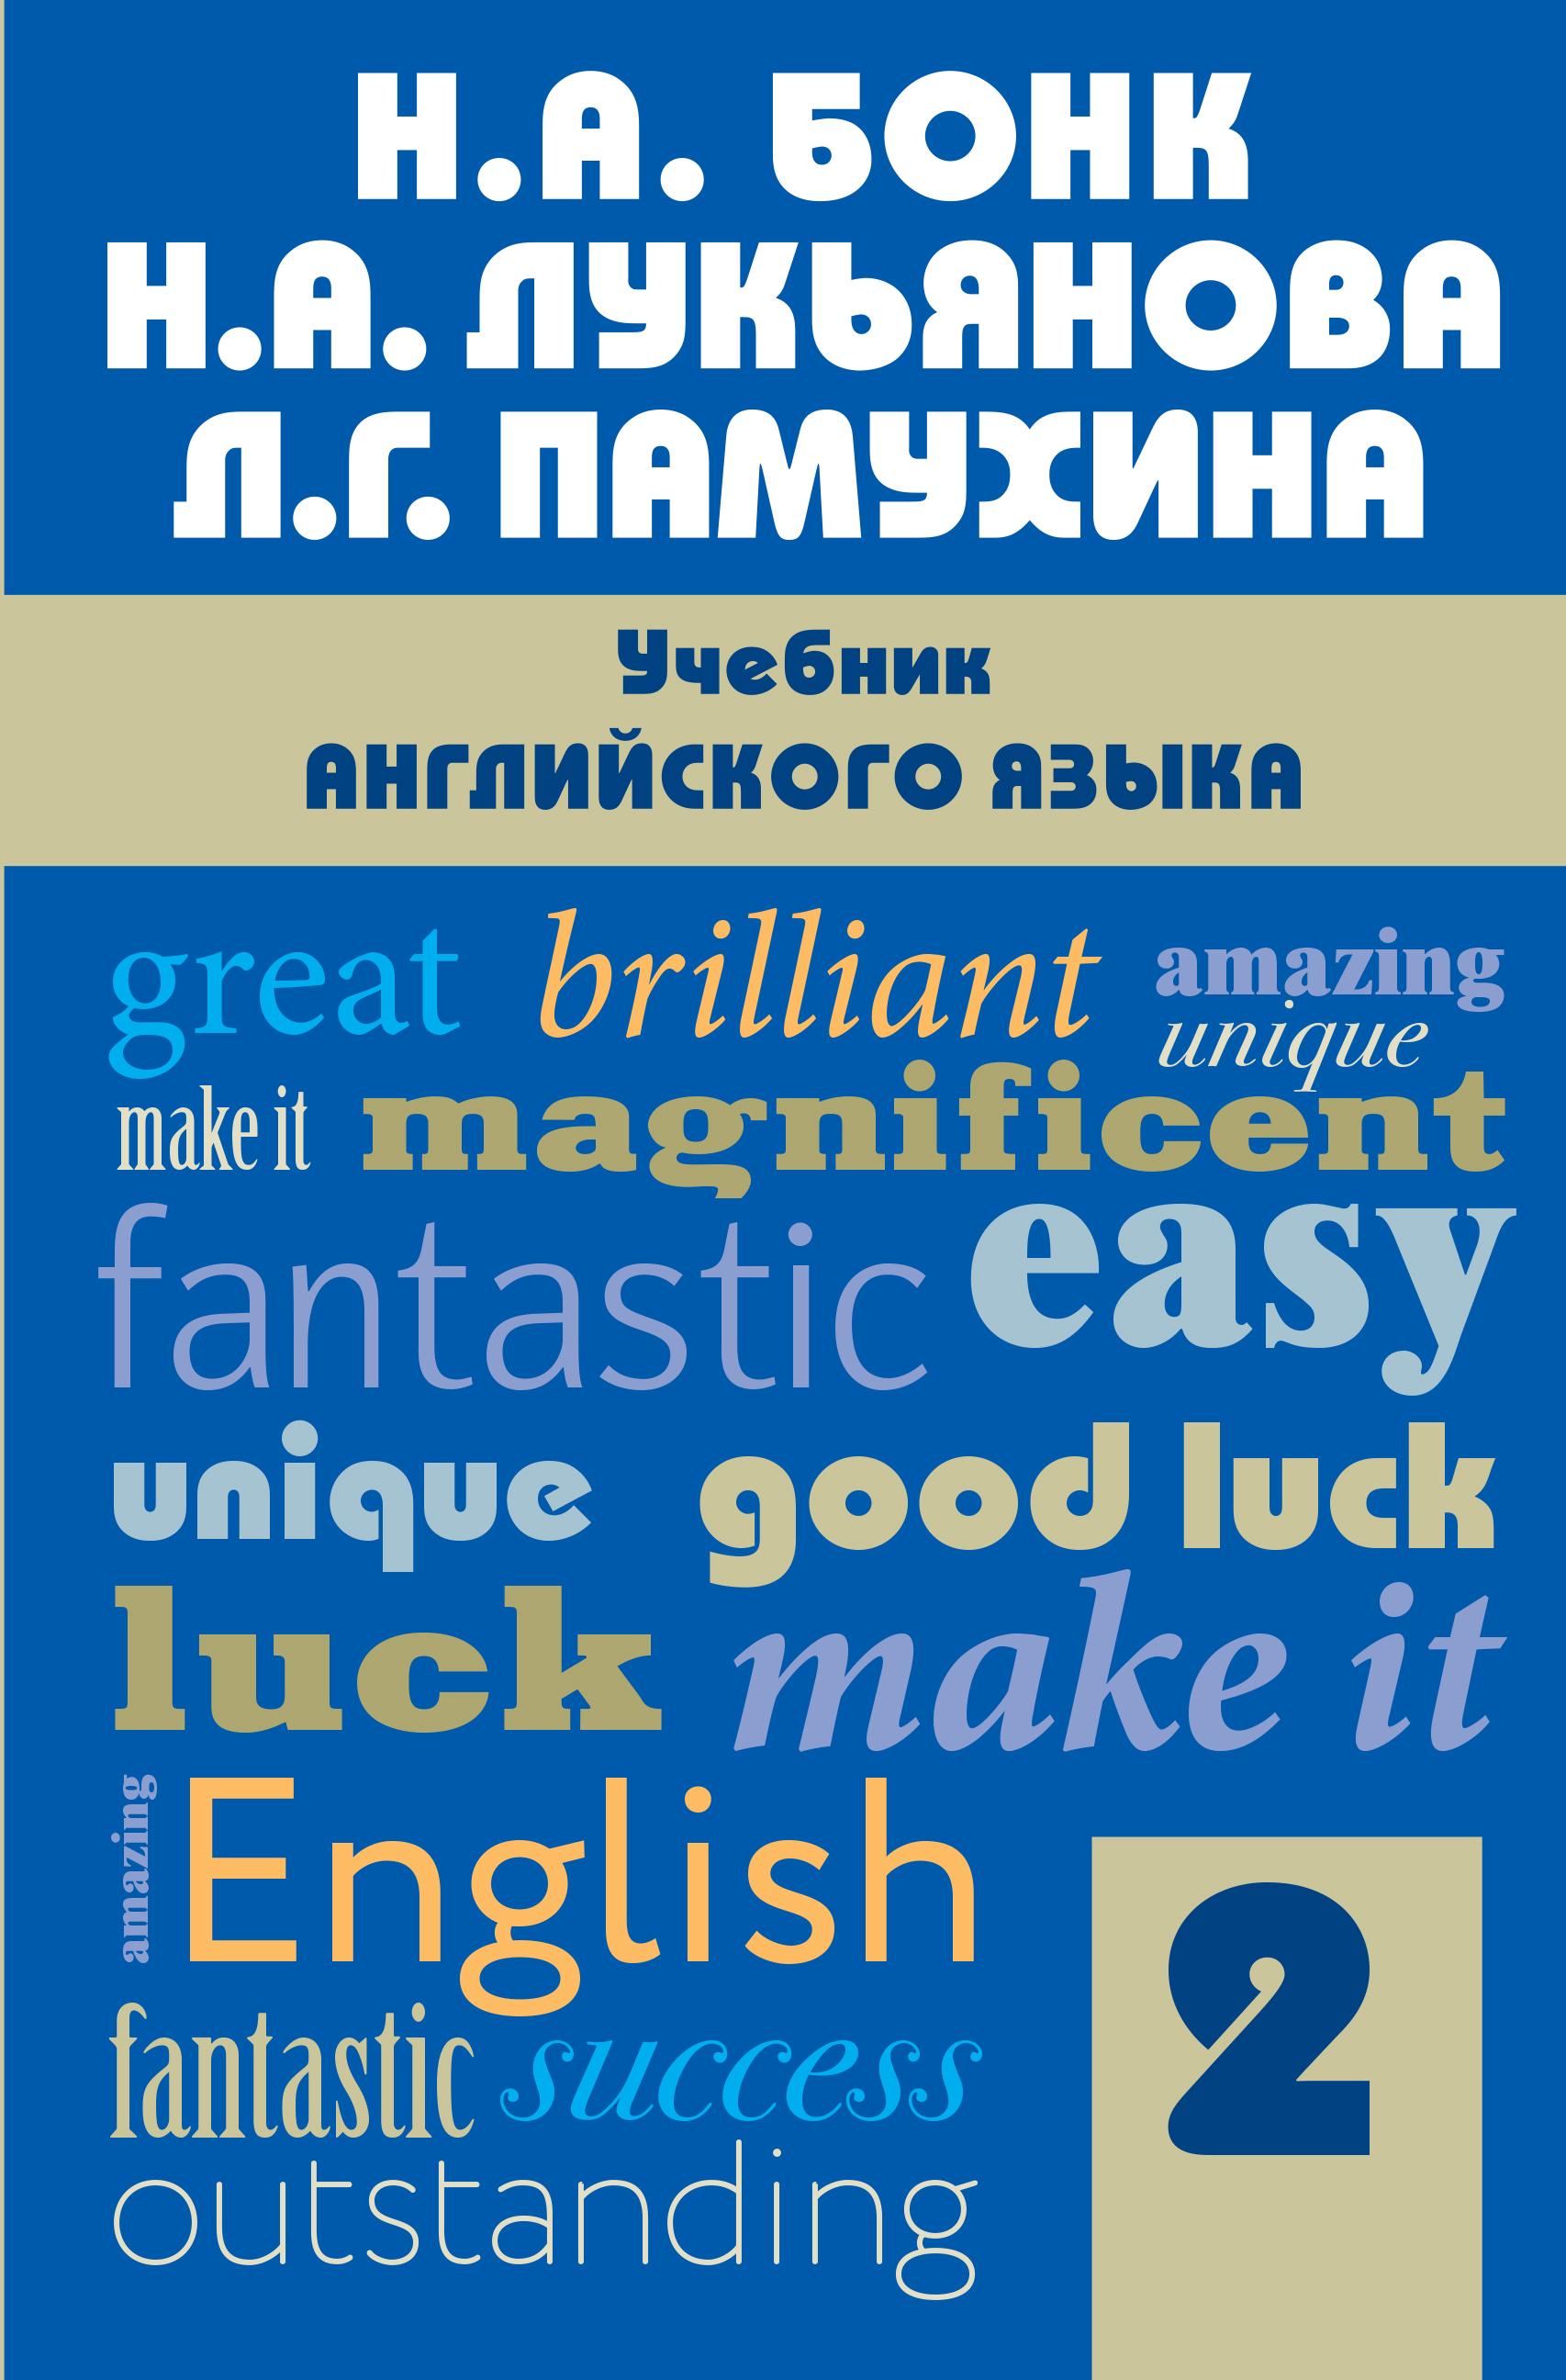 Uchebnik anglijskogo jazyka. Chast 2